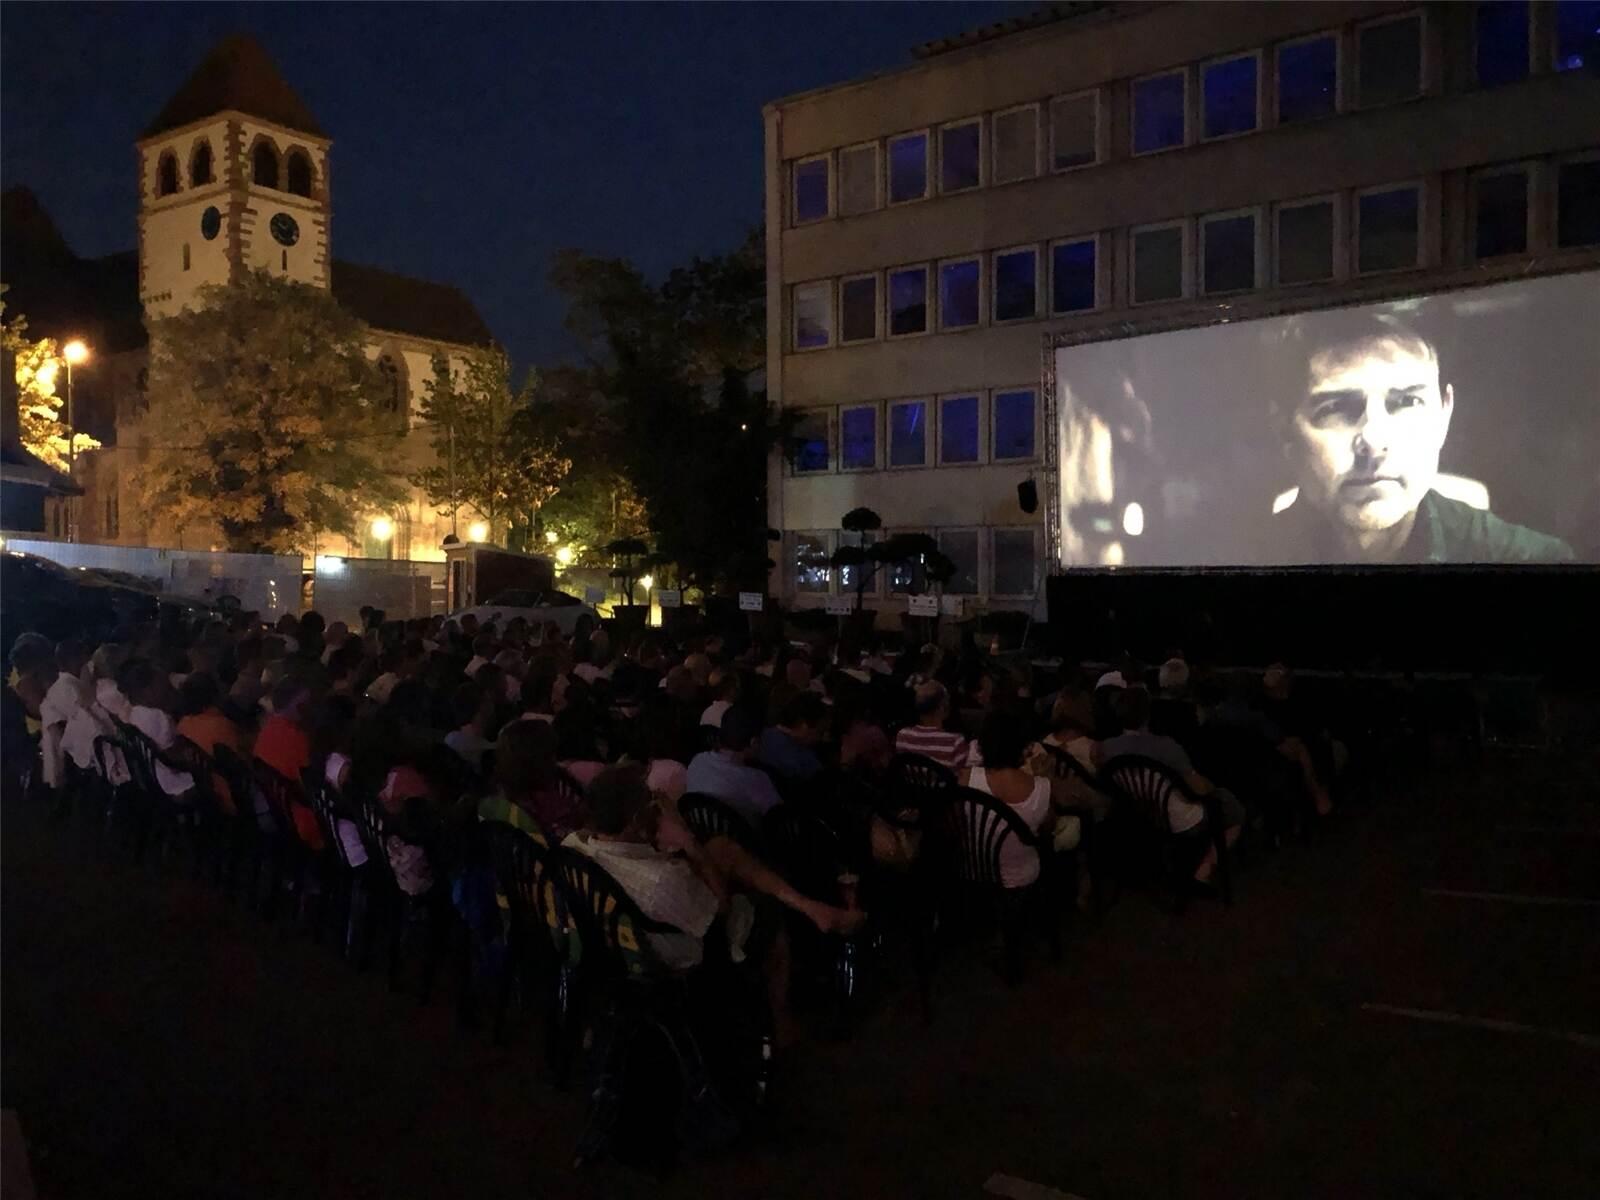 Kinos In Pforzheim